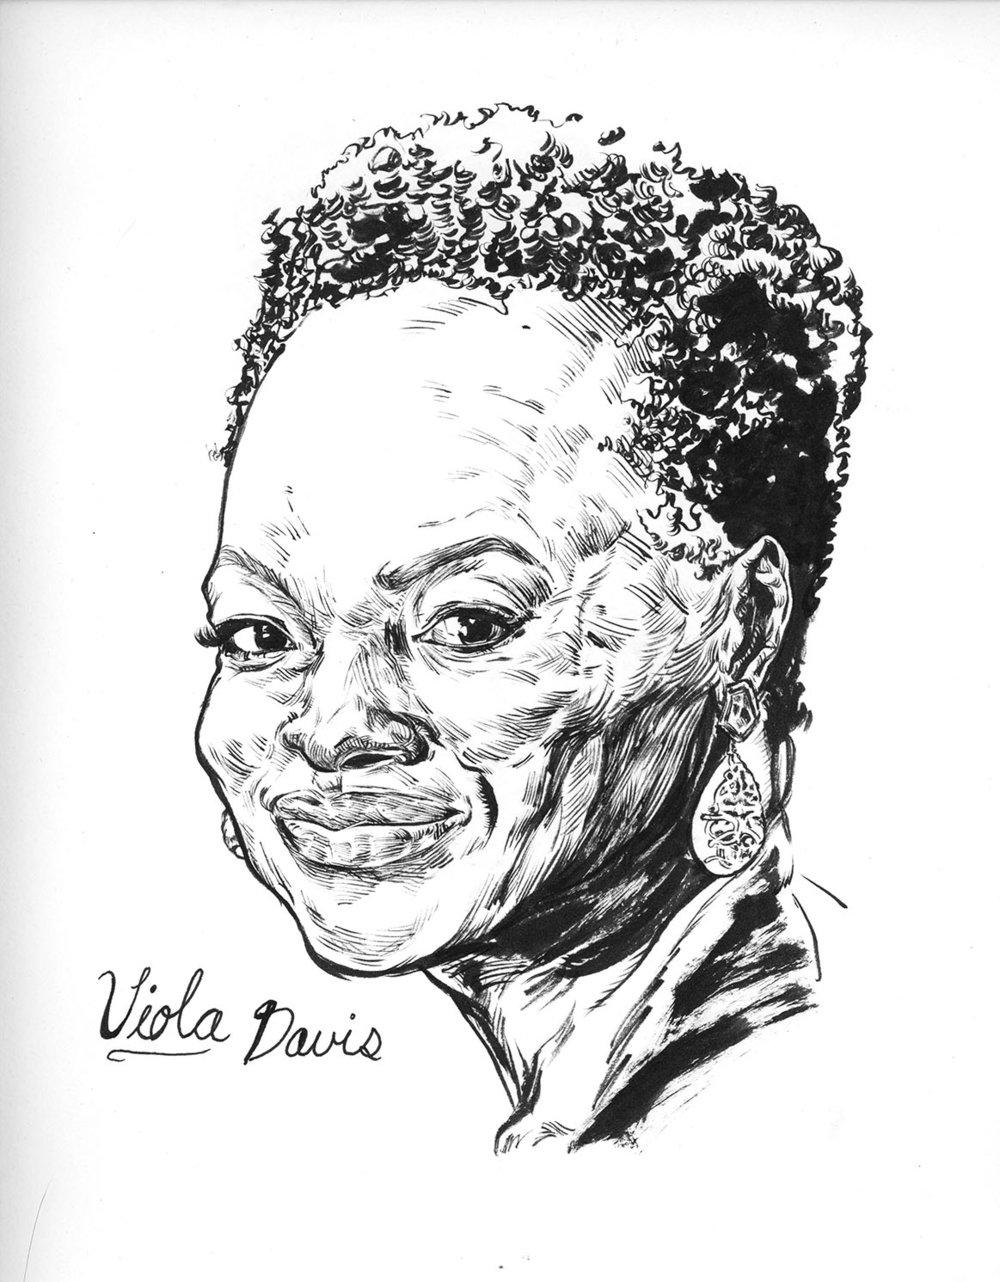 Viola_Davis_sketch.jpg